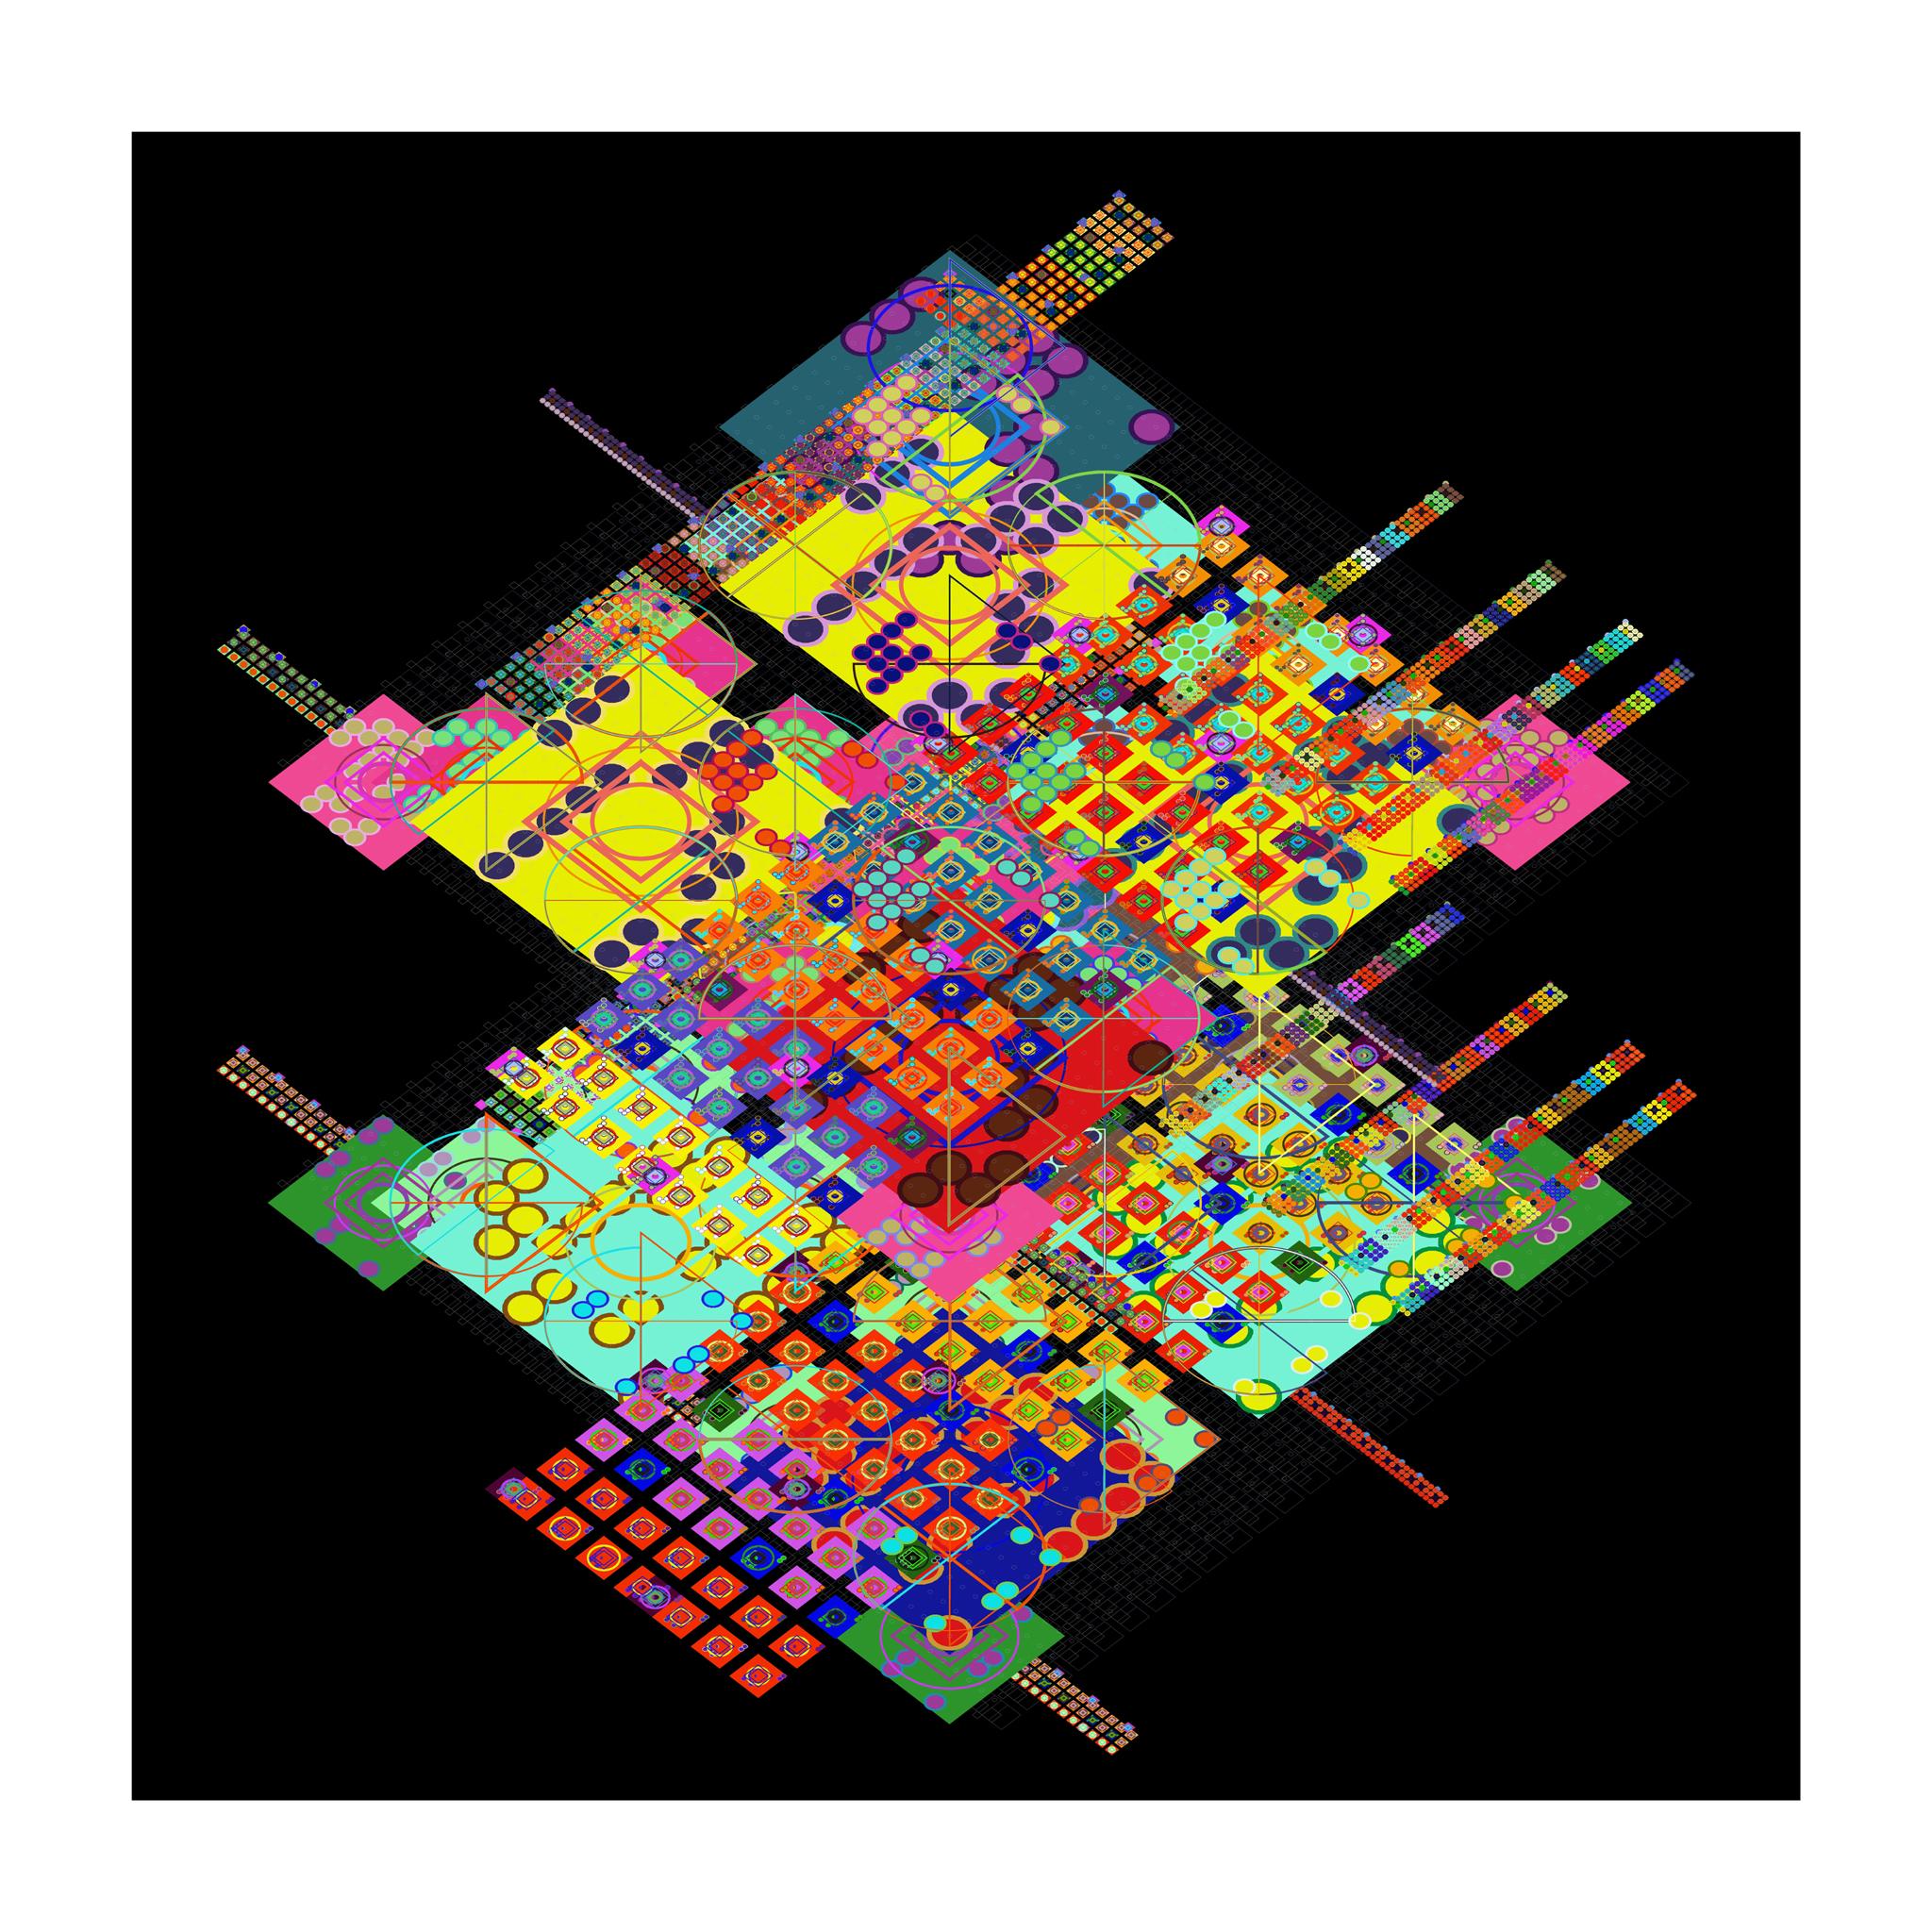 Mark Wilson, e16005, Archival Ink Jet Print auf Leinwand, 100 x 100 cm, 2011